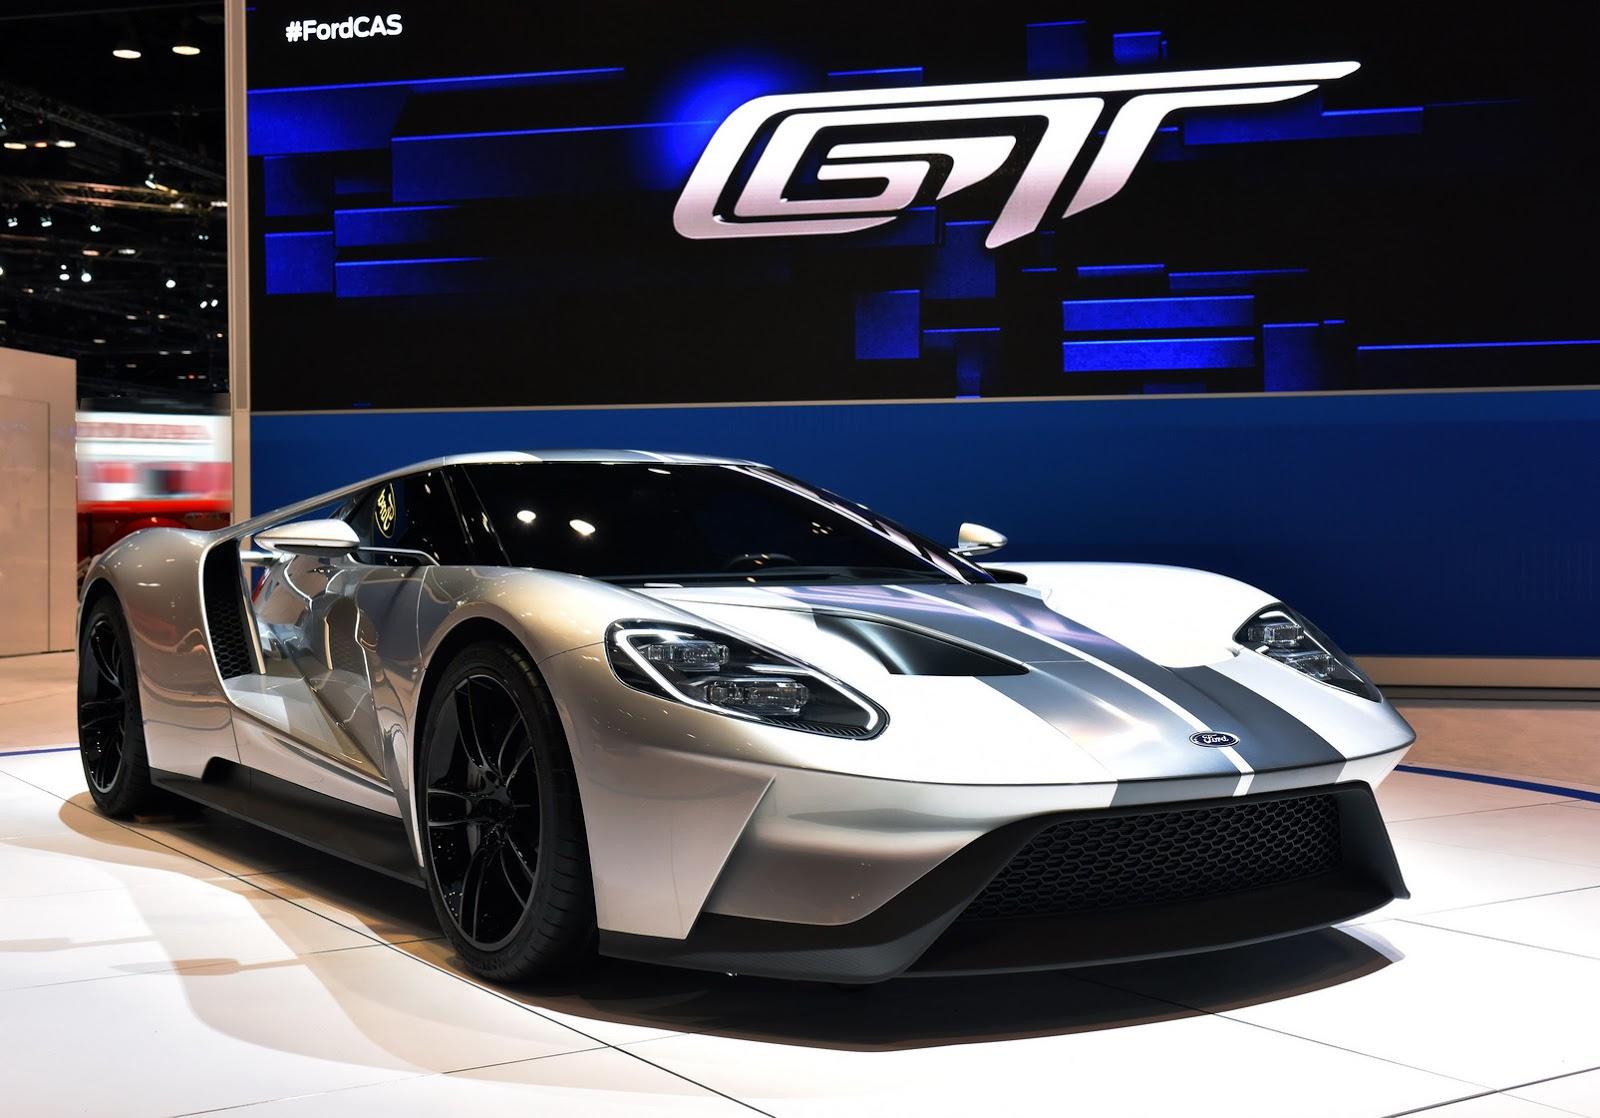 Ford predstavlja GT model u Liquid Silver boji